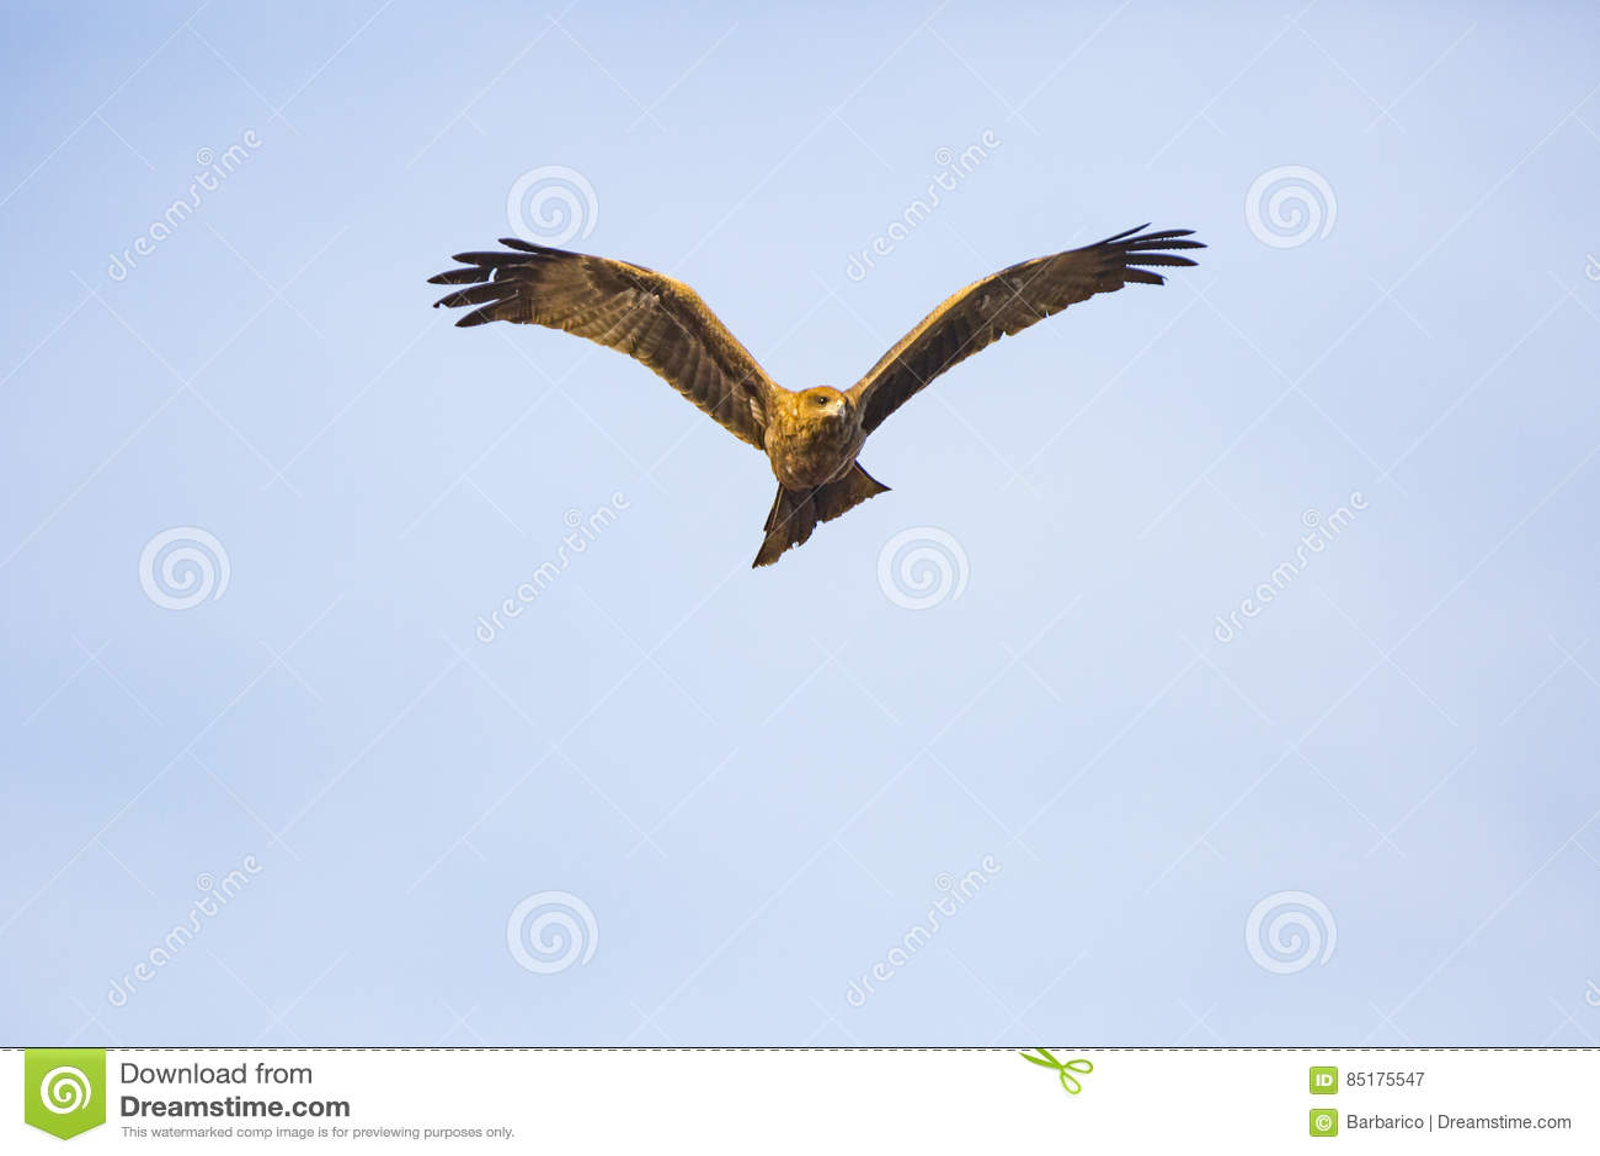 a flying hawk stock